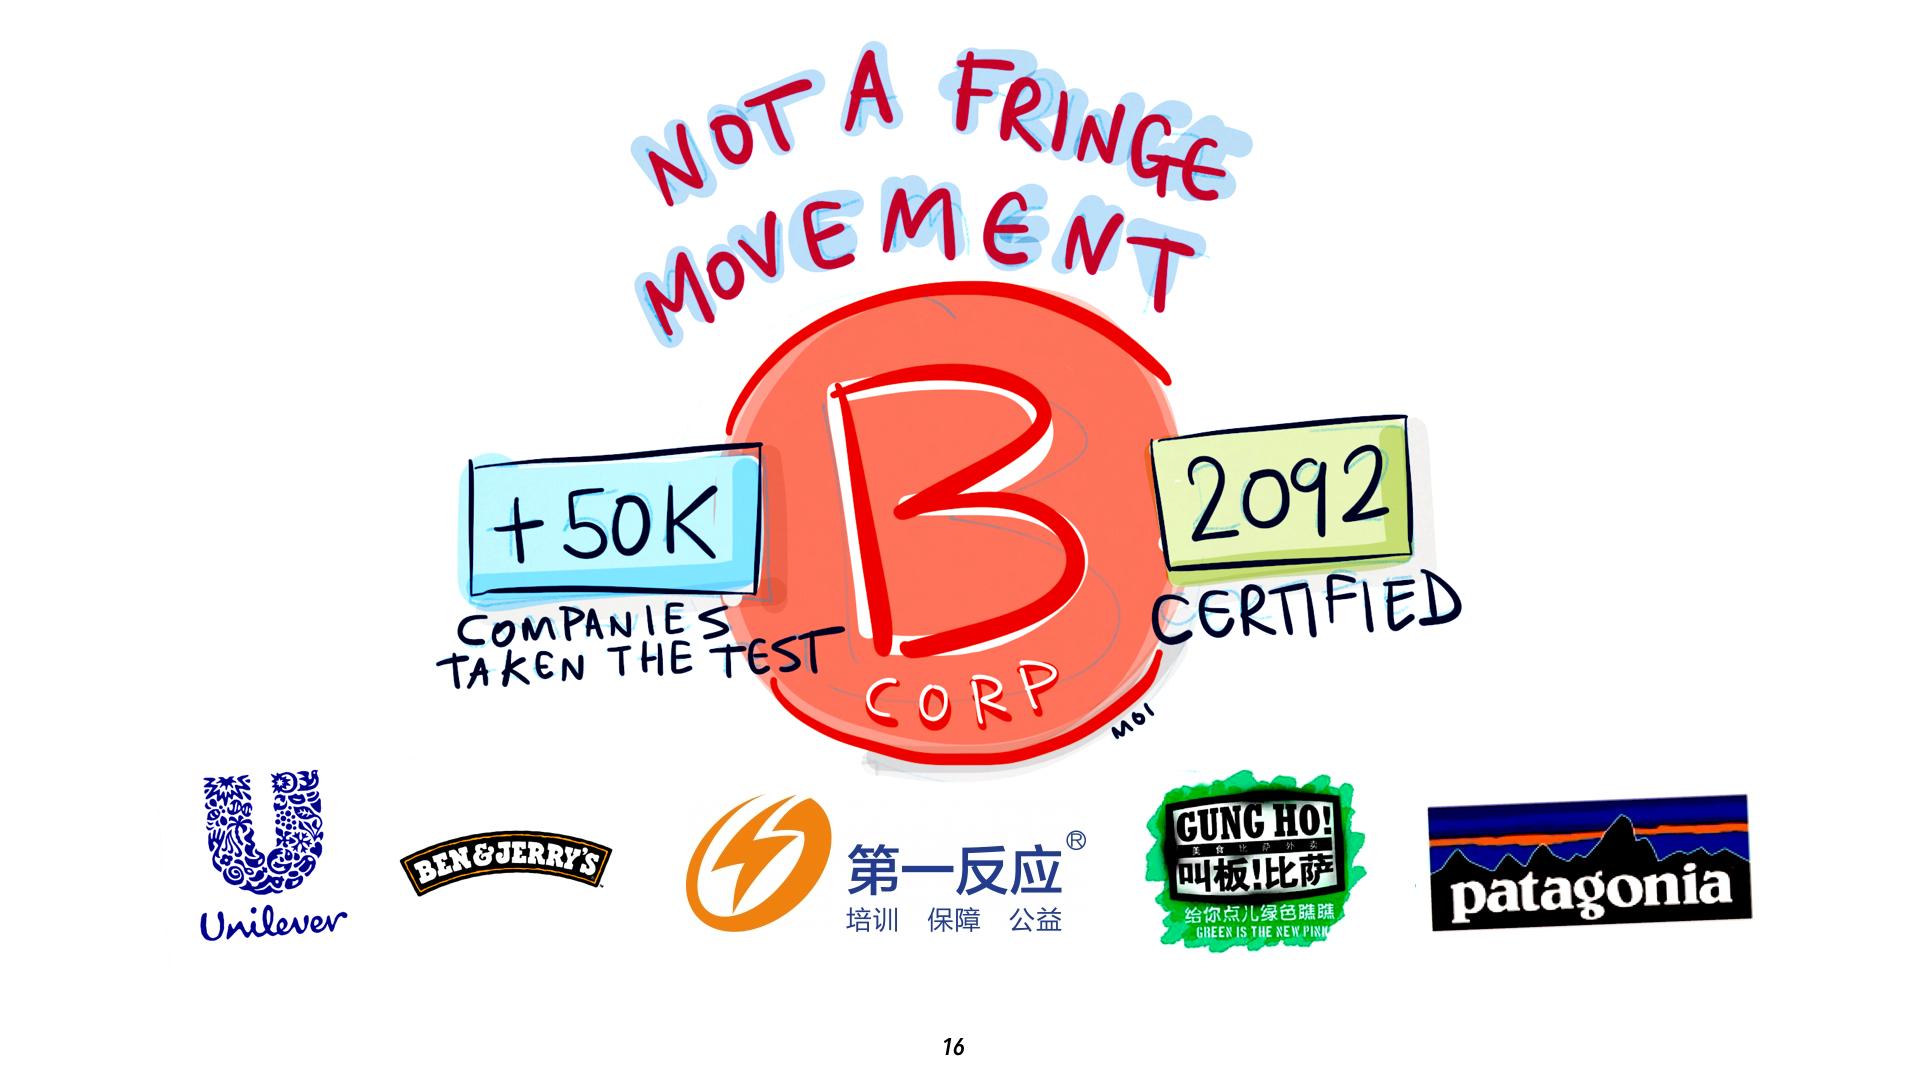 MoI_EO_B Corp_02.016.jpeg